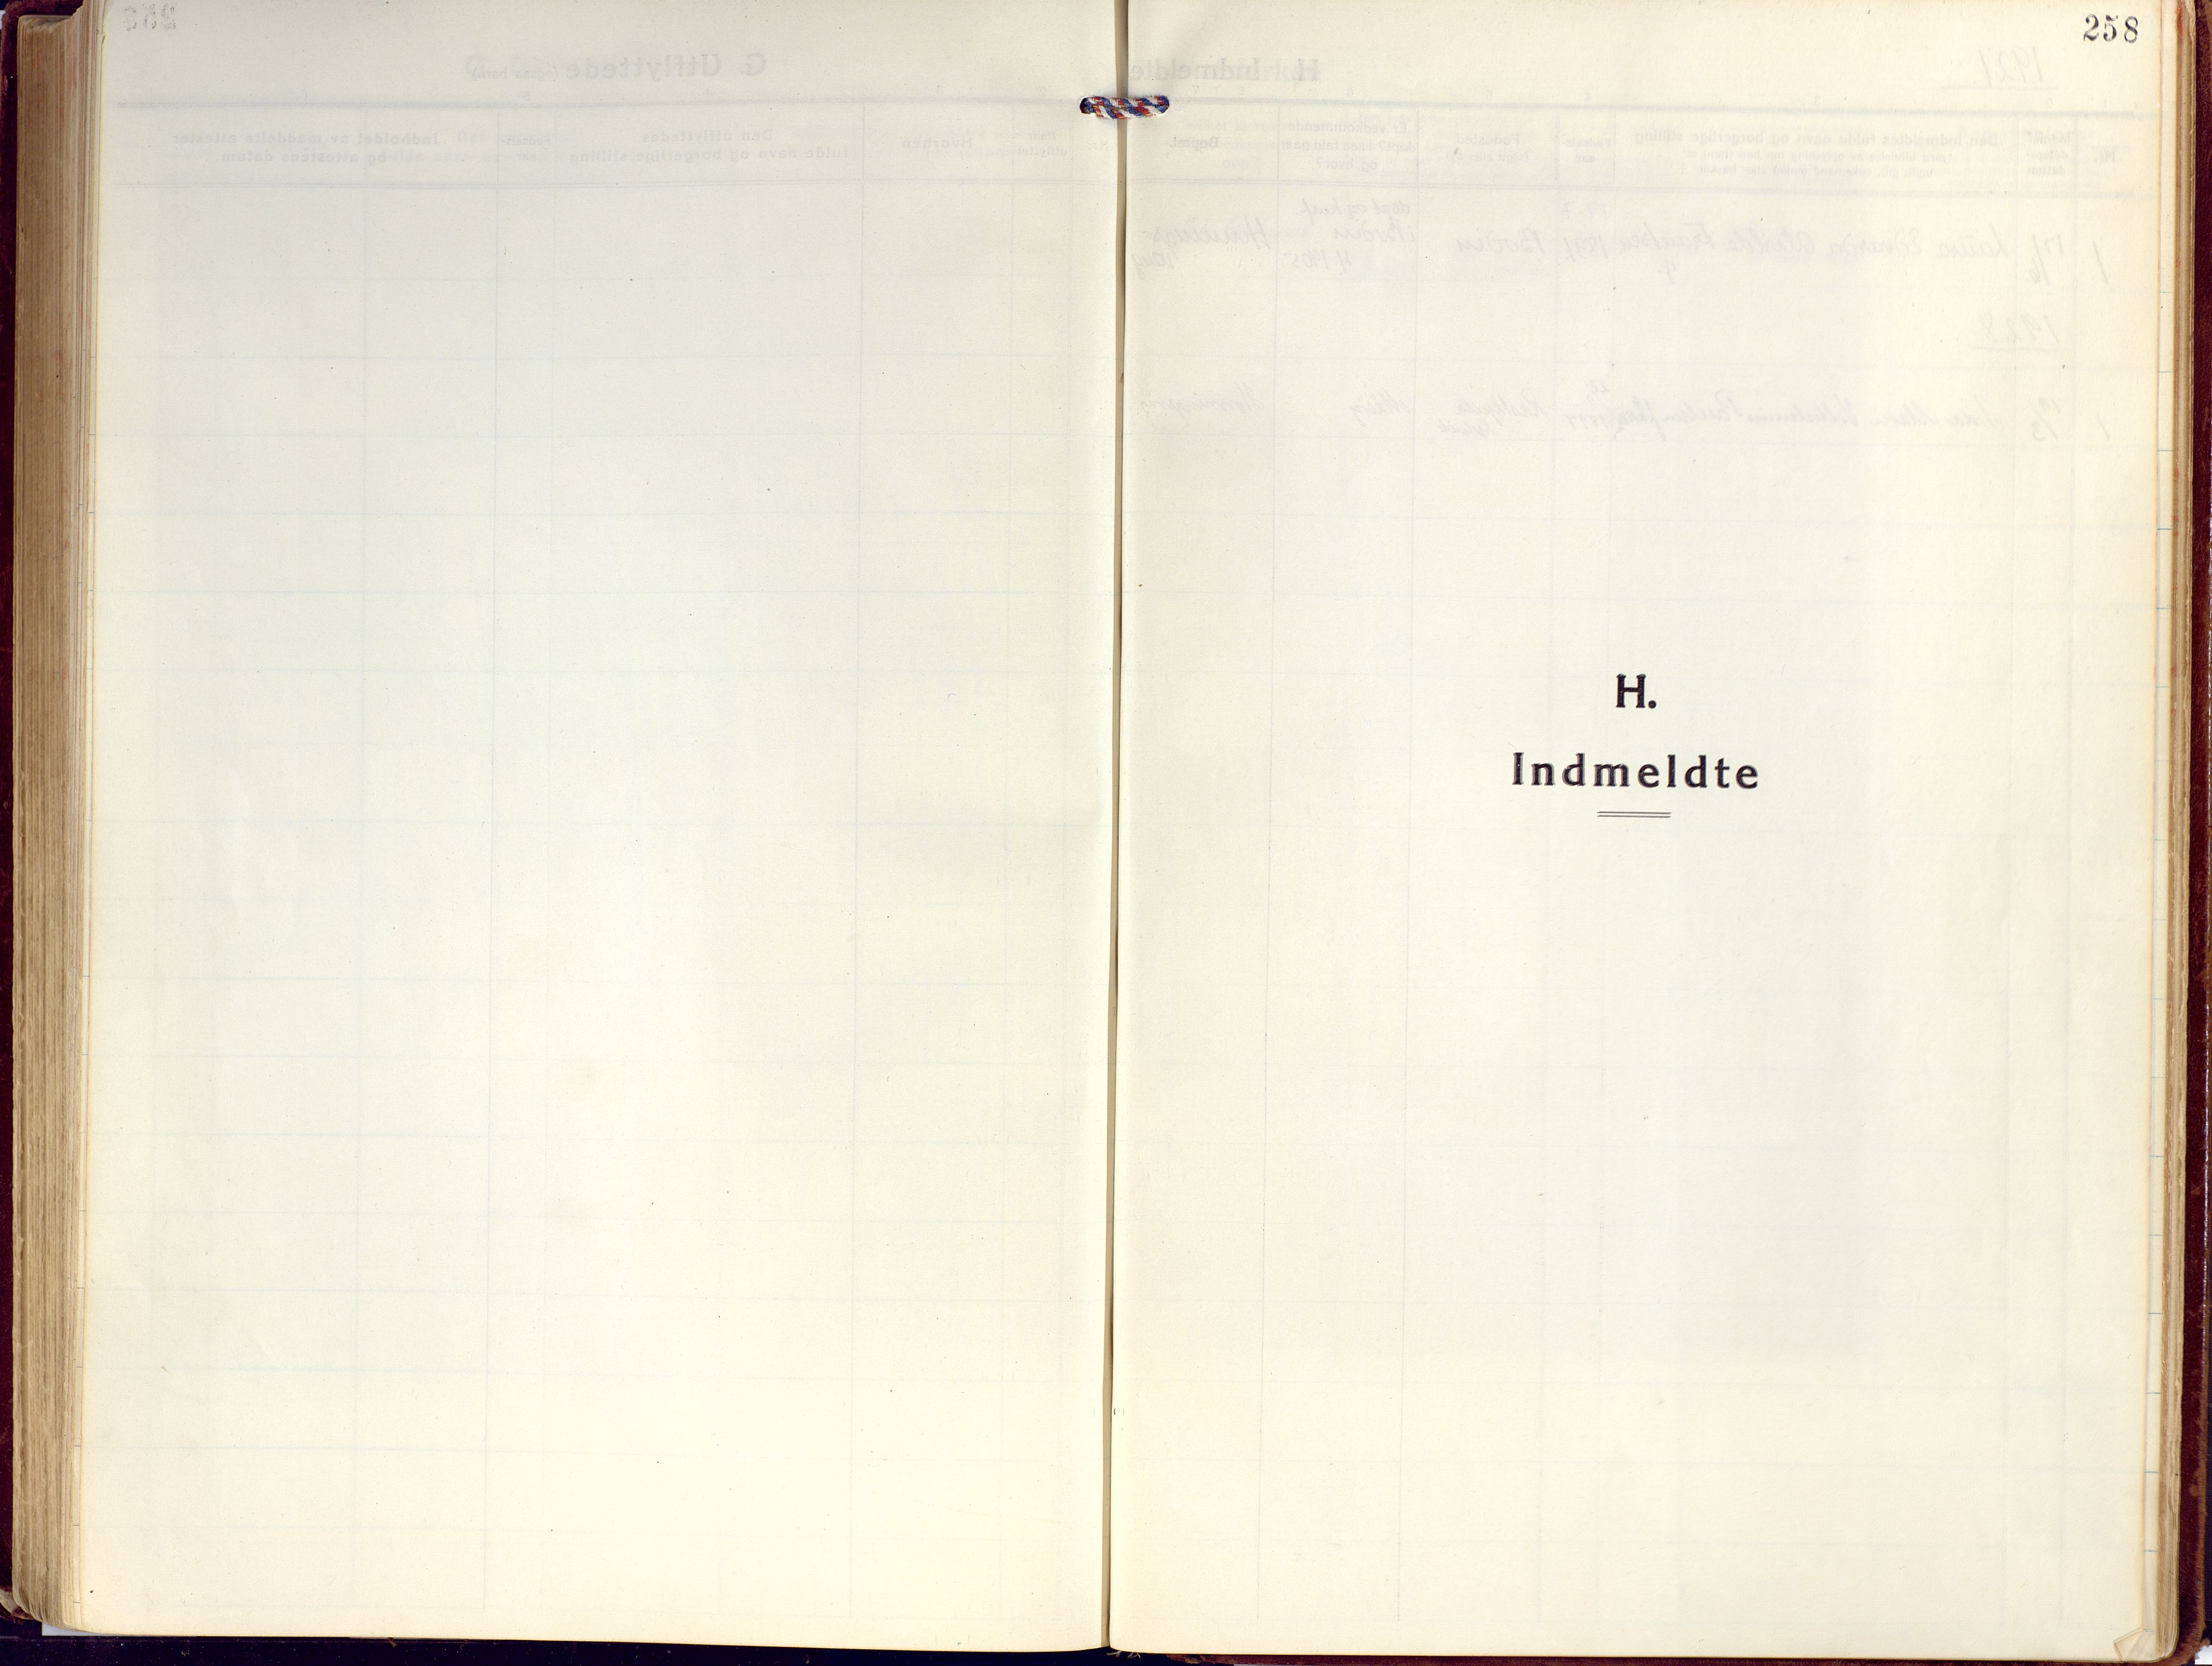 SATØ, Kjelvik/Nordkapp sokneprestkontor, H/Ha/L0002kirke: Ministerialbok nr. 2, 1920-1929, s. 258